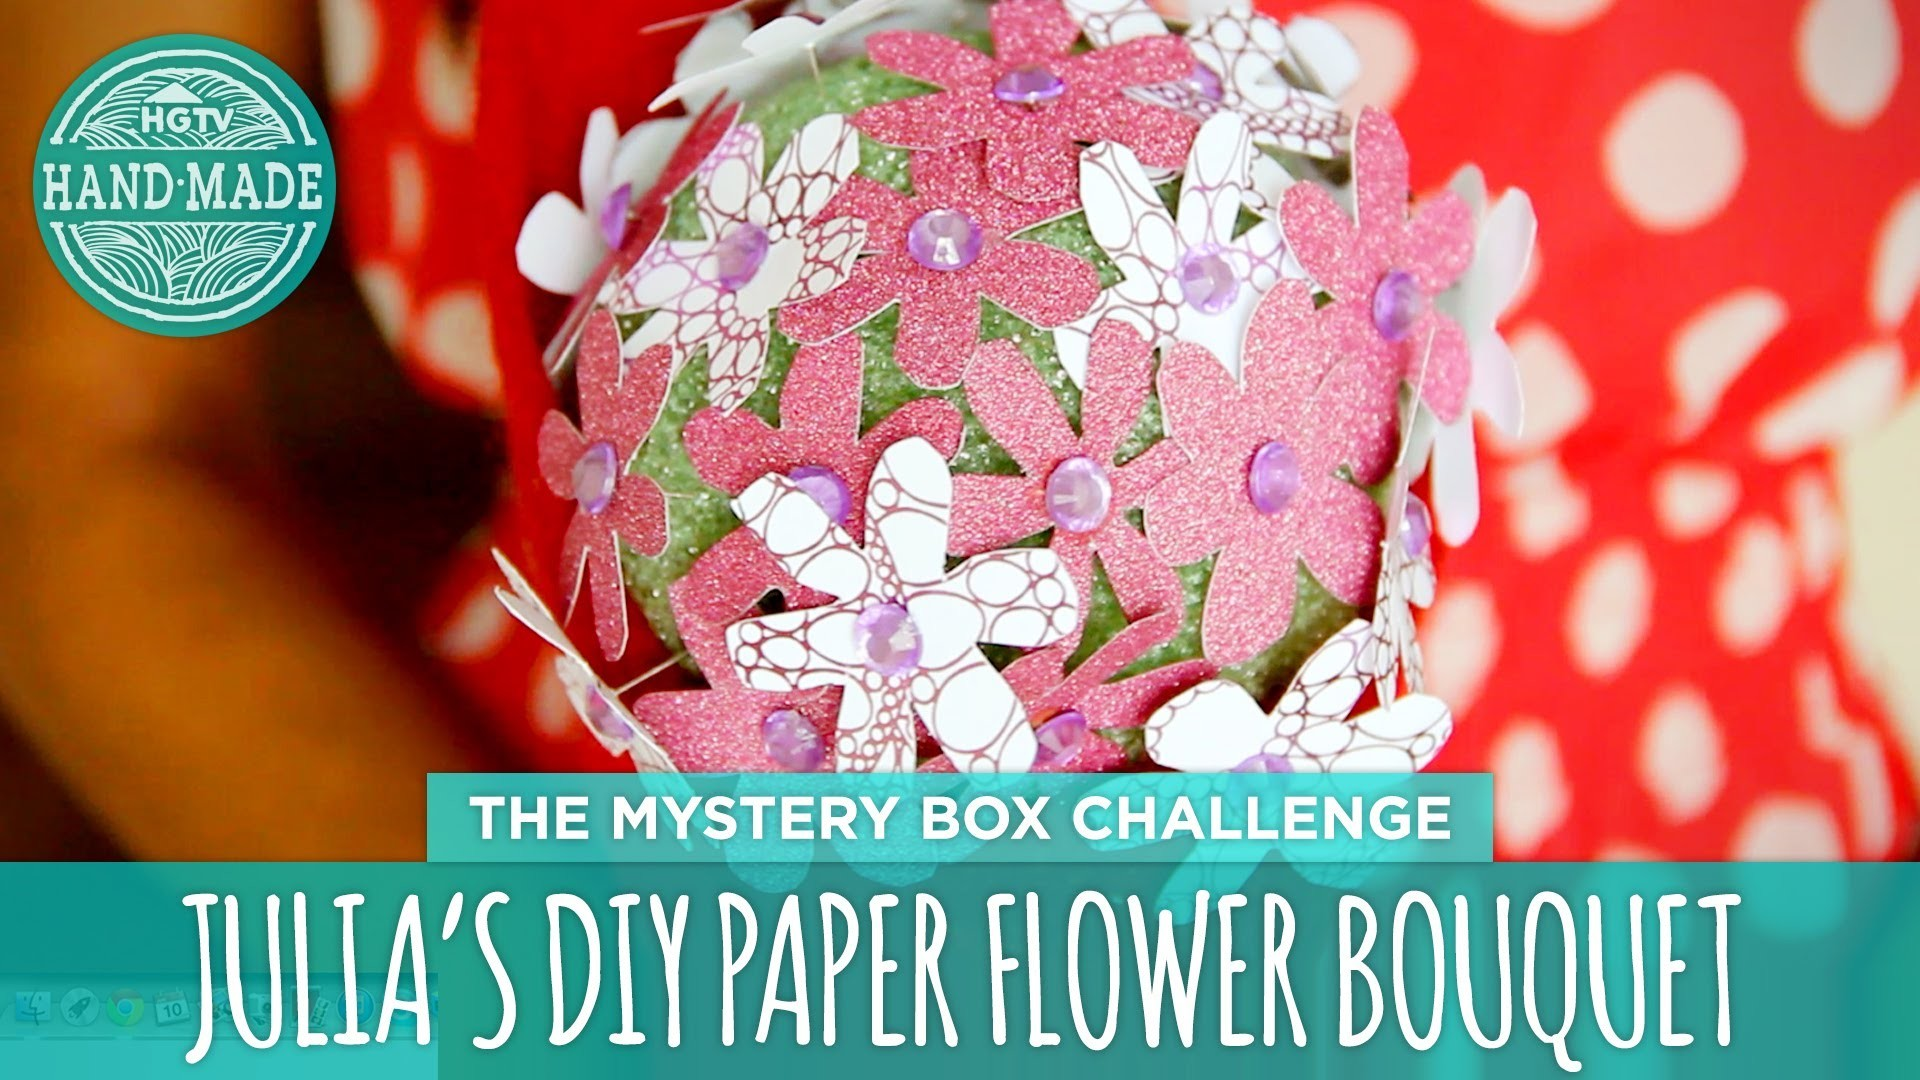 Julia's DIY Paper Flower Bouquet - HGTV Handmade Mystery Box Challenge